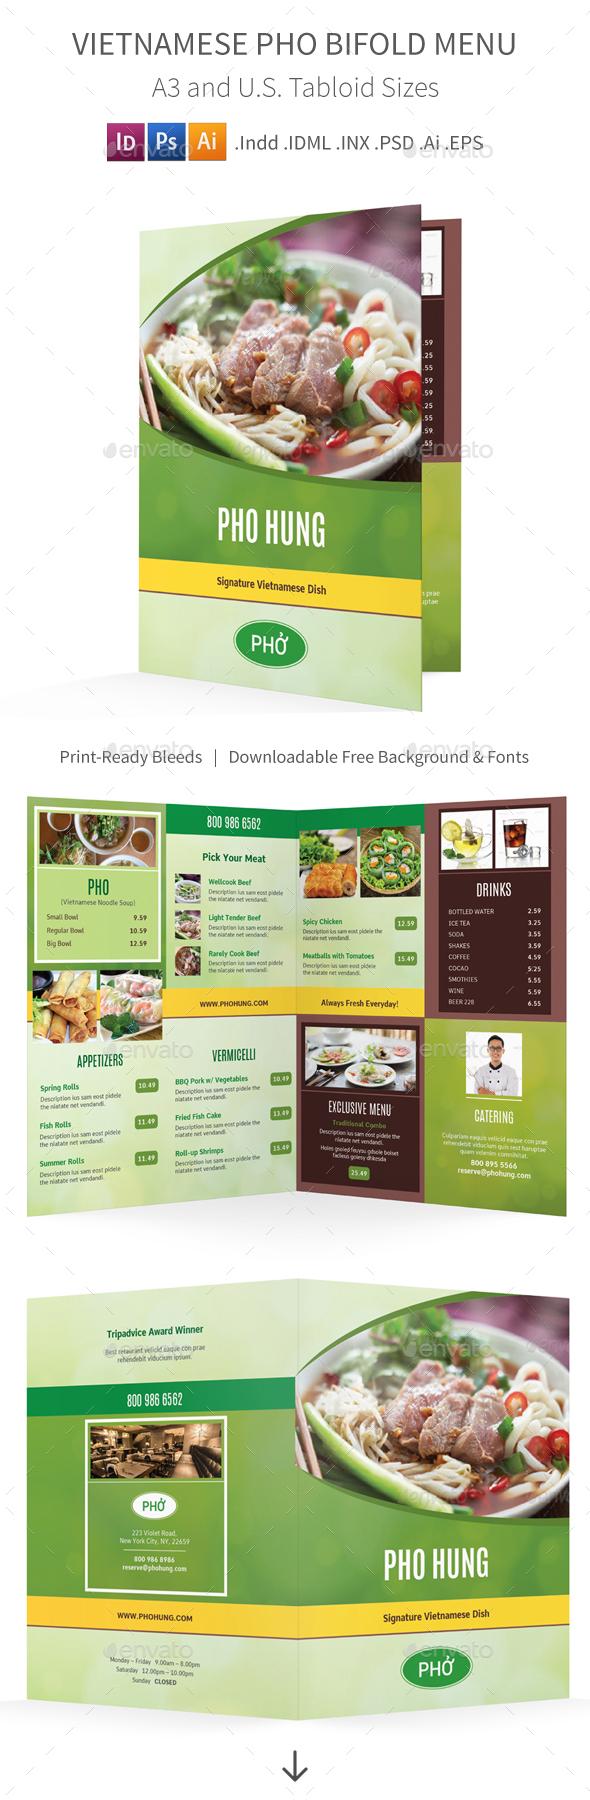 Vietnamese Pho Restaurant Bifold / Halffold Menu - Food Menus Print Templates